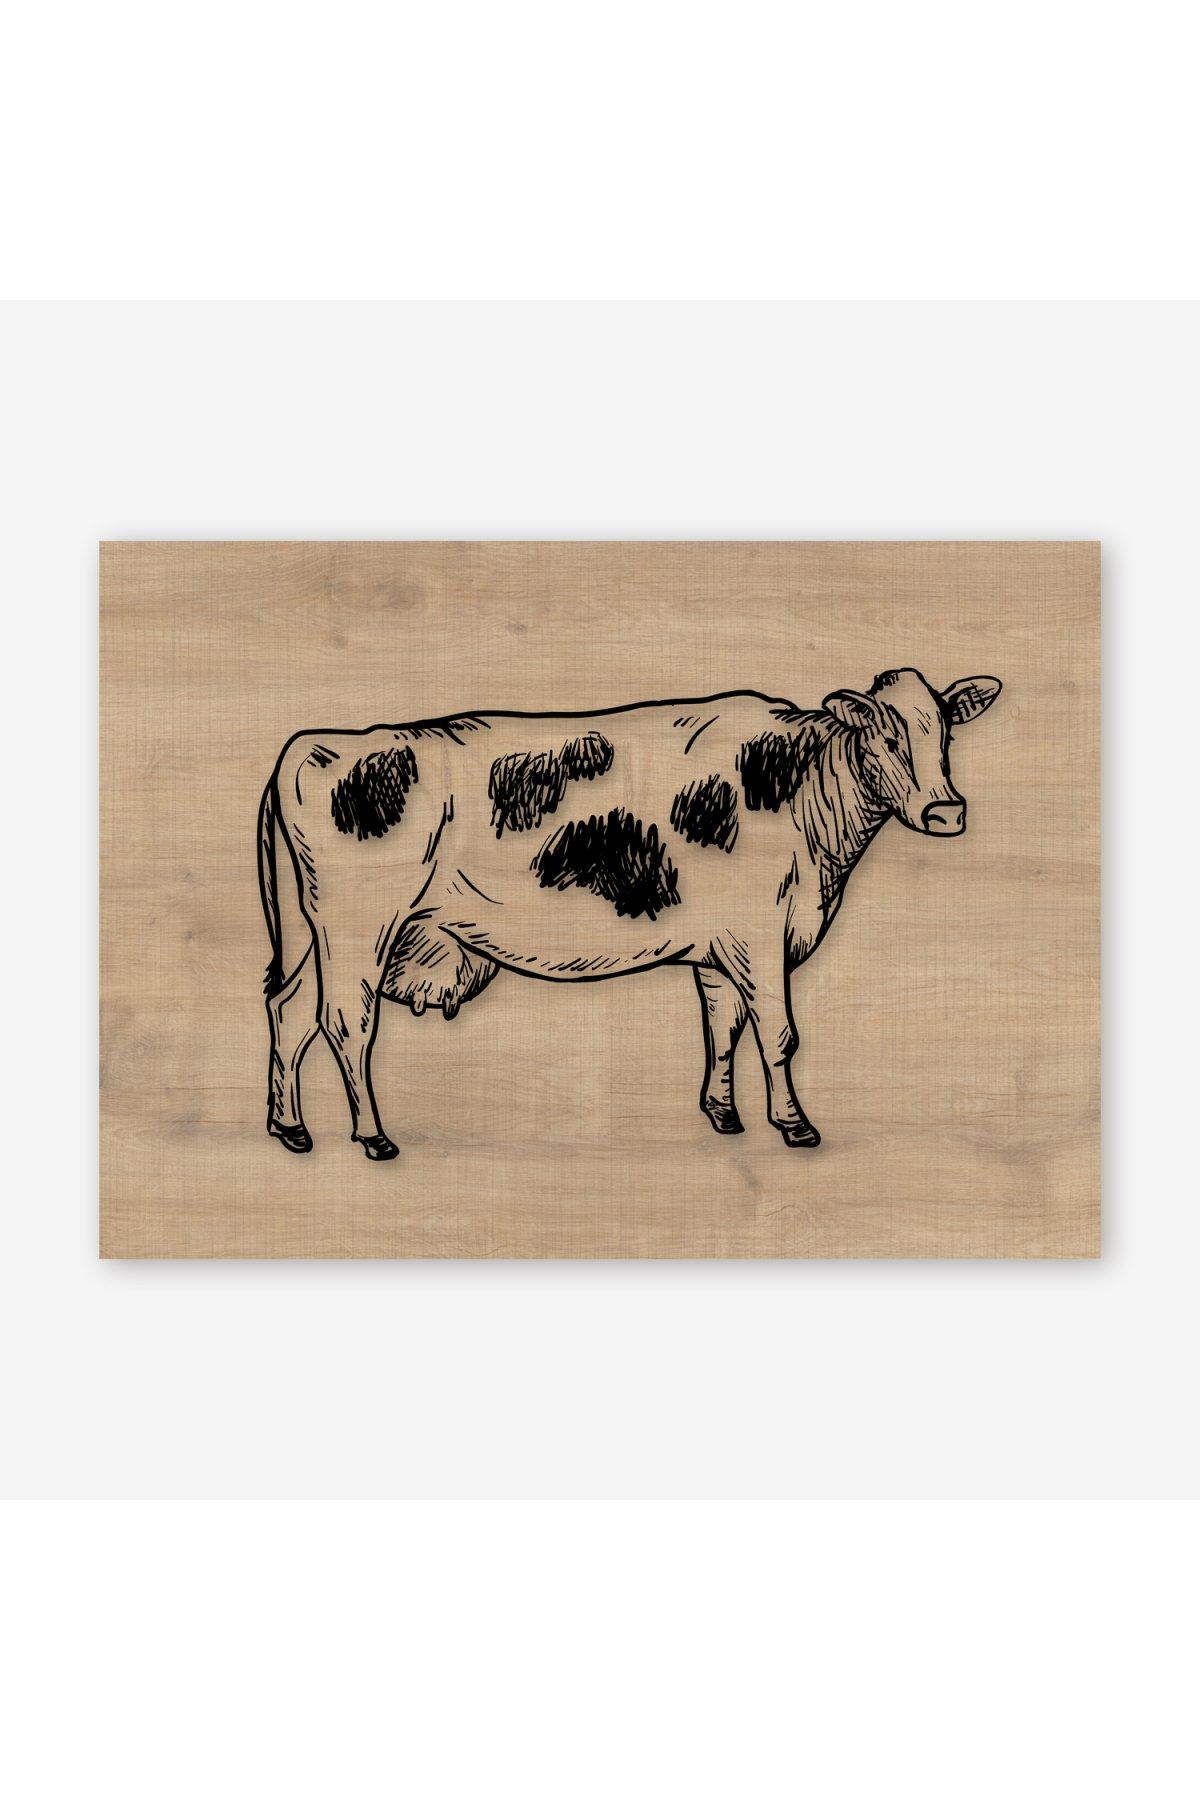 Evsimo Decorative Wooden Frame Hm -119